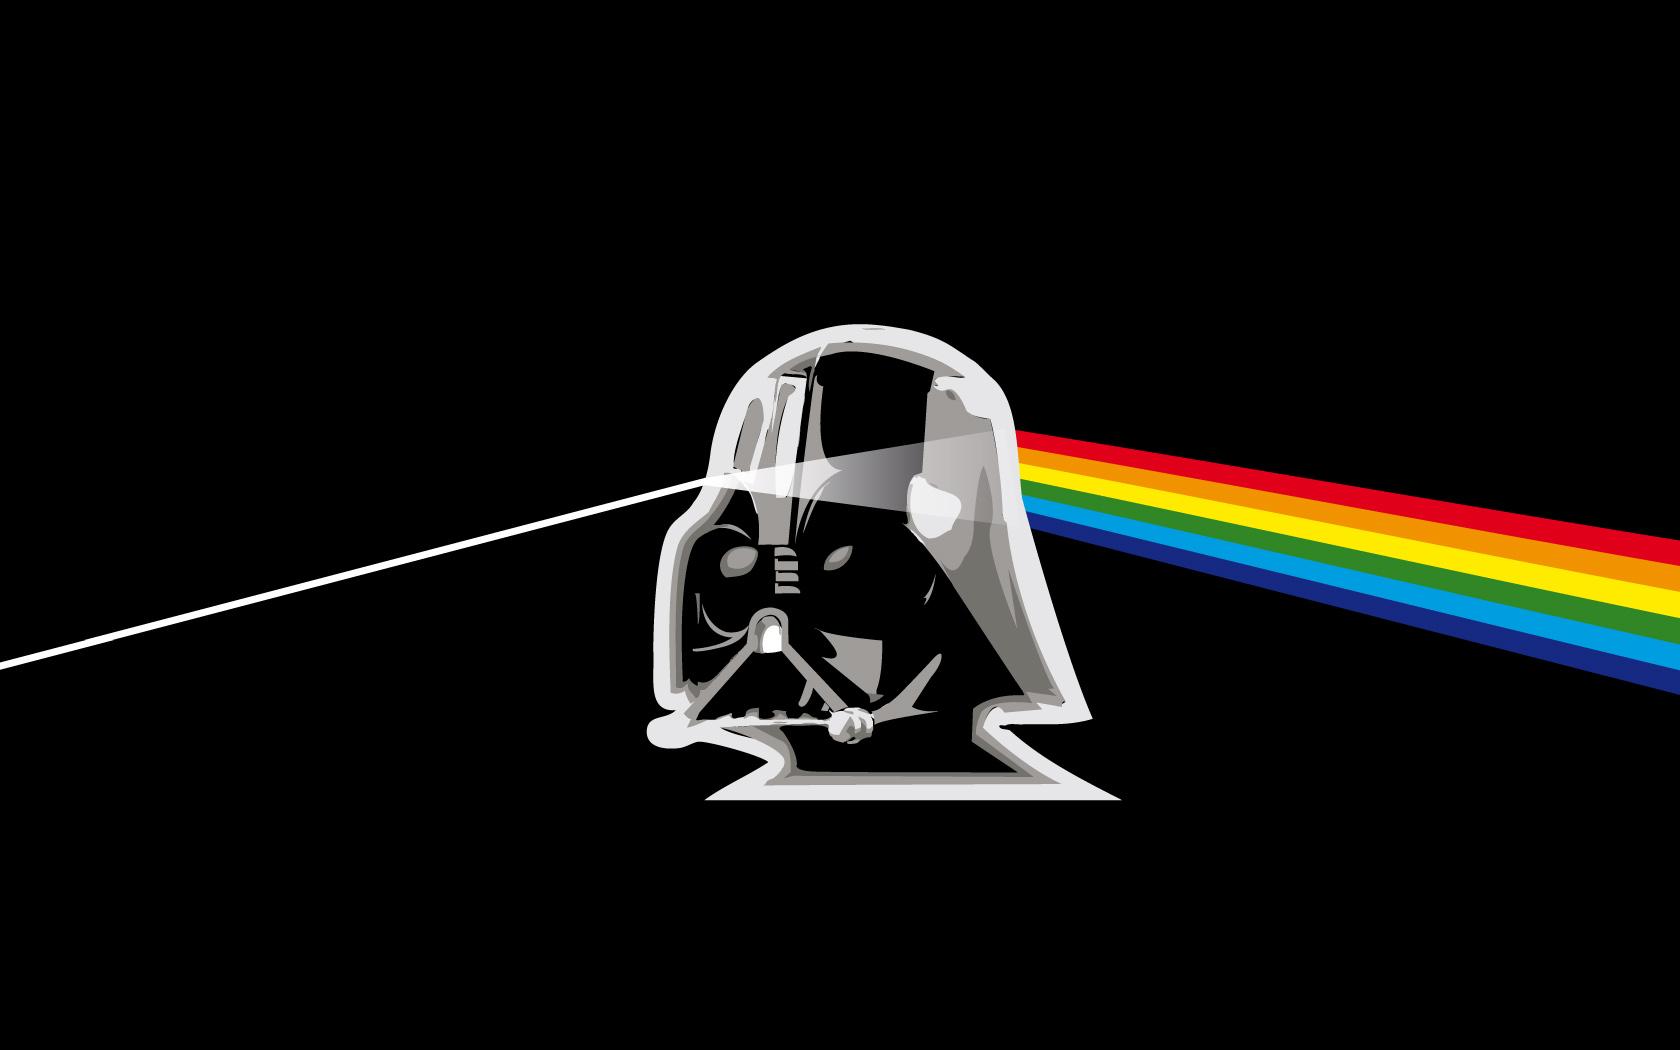 Pink Floyd Darth Vader Prism Rainbows Wallpaper 1680x1050 182654 Wallpaperup